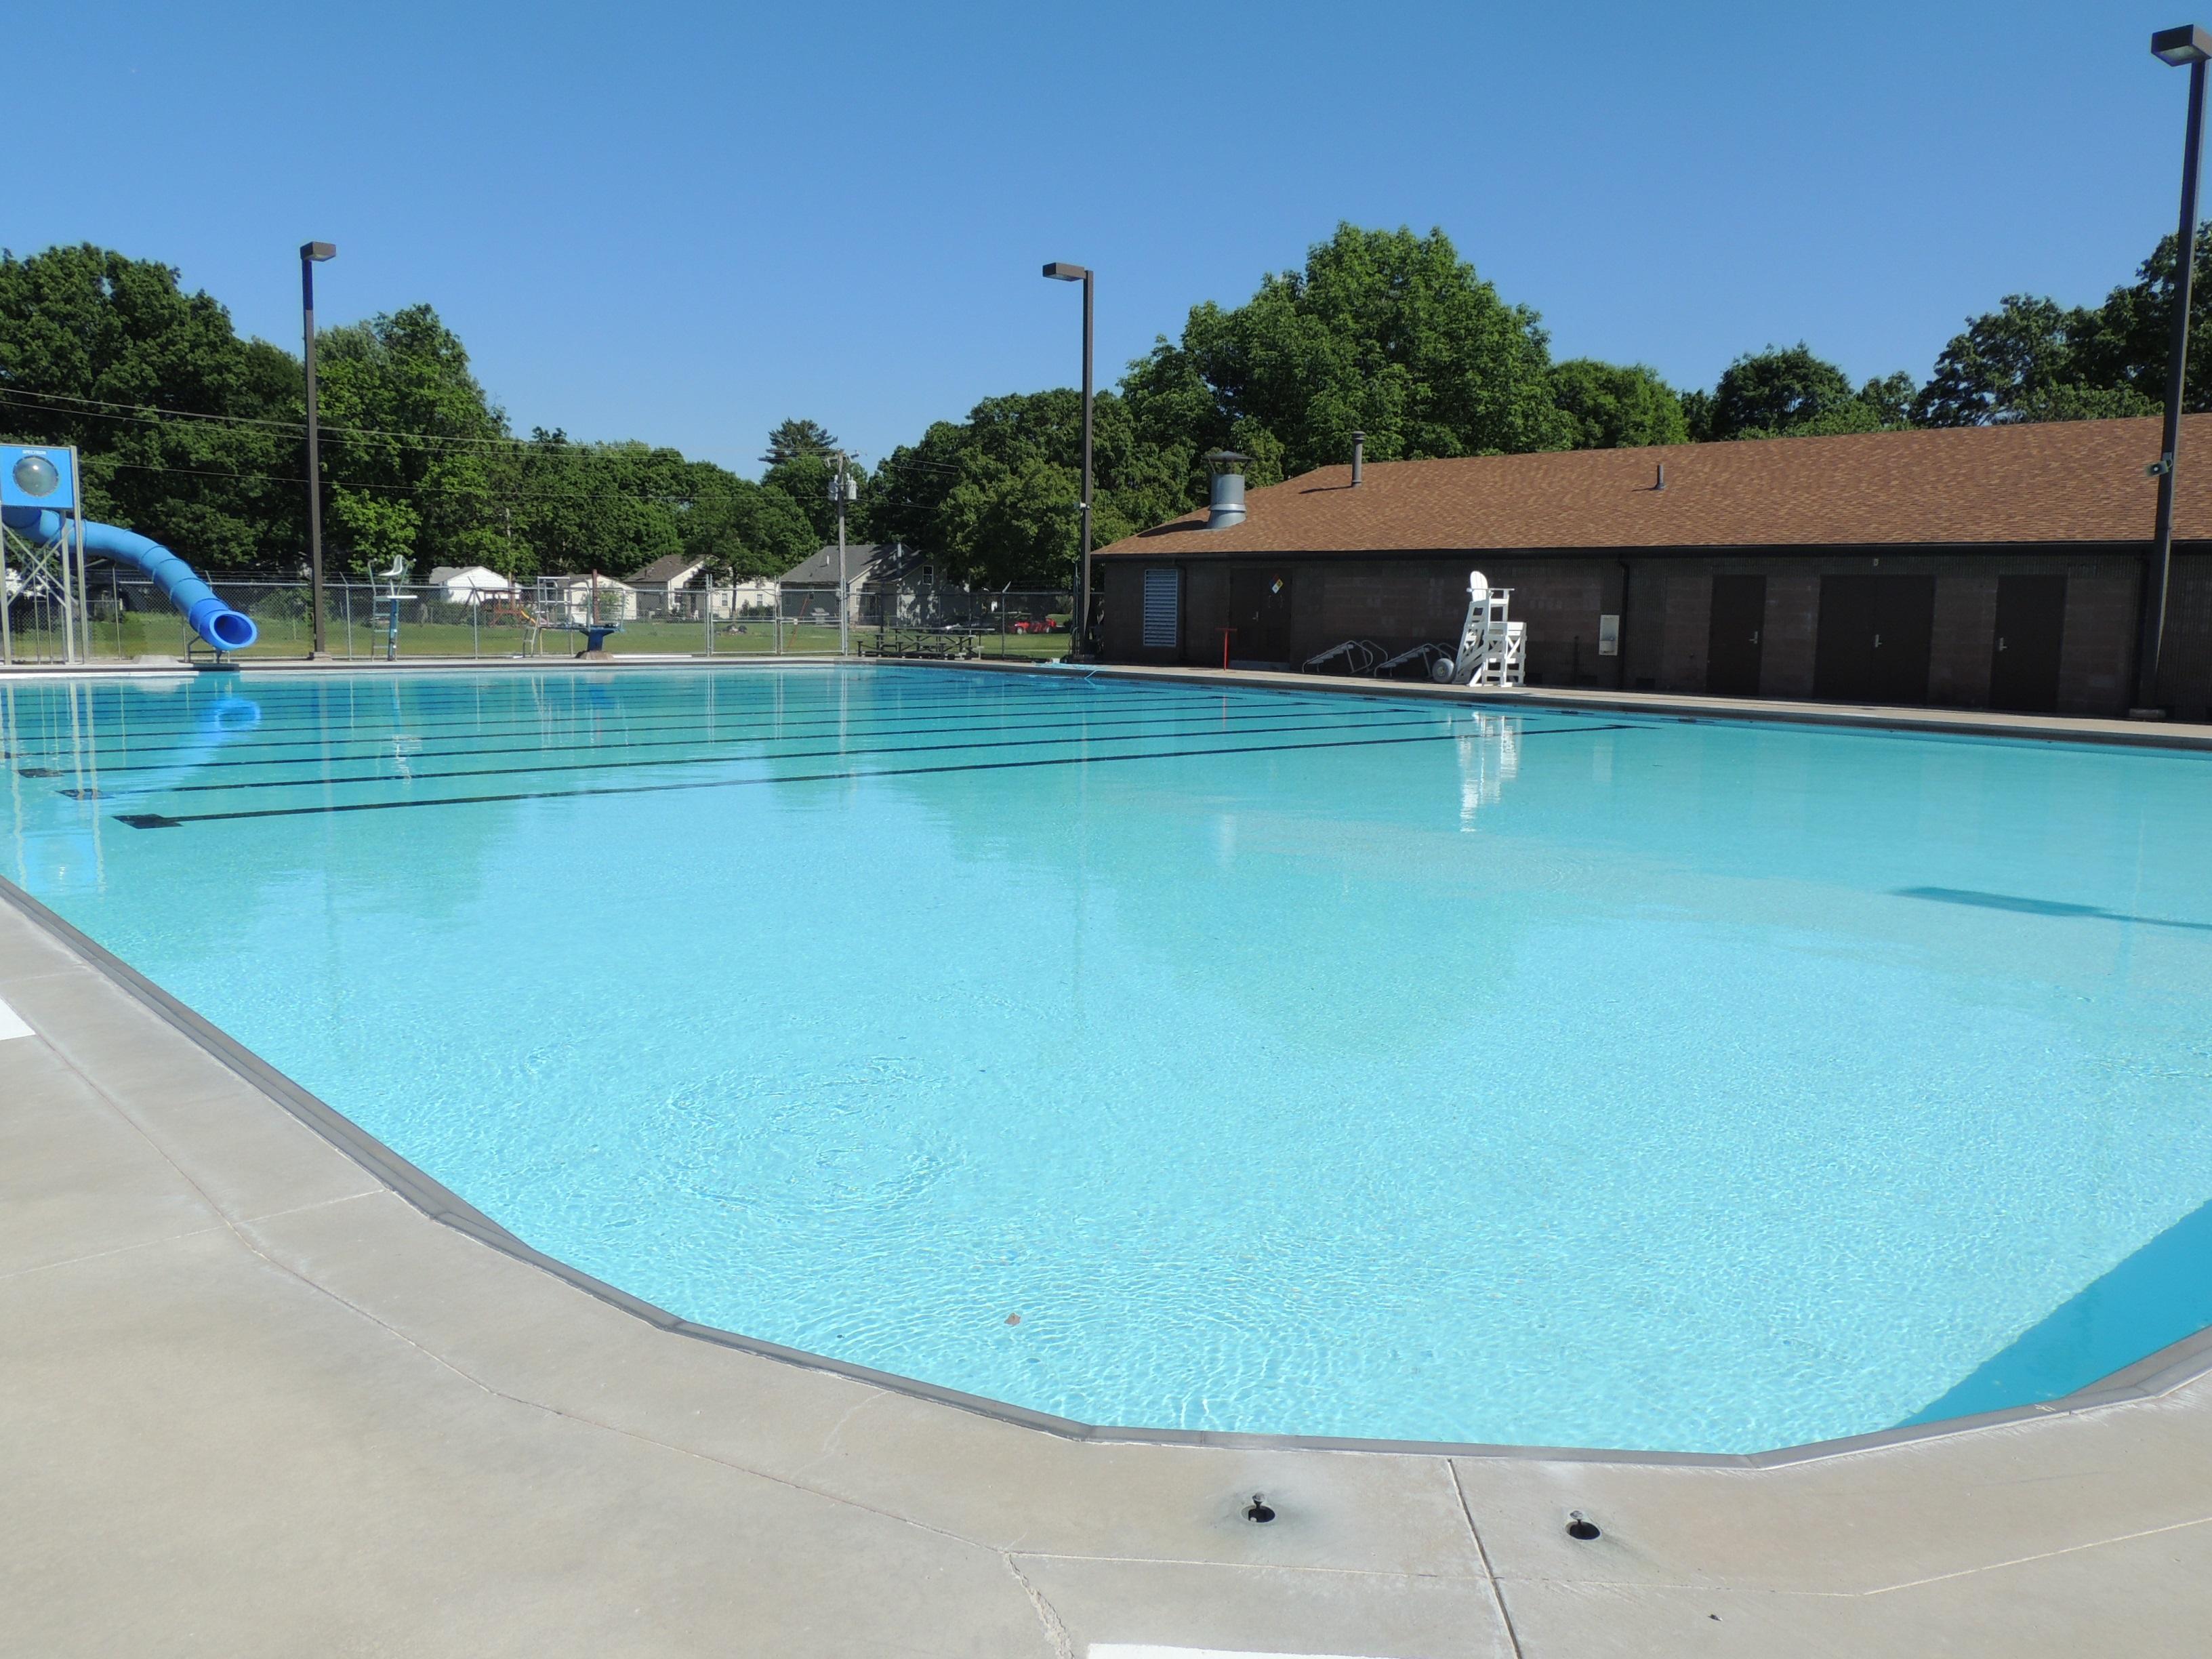 No Swimming Pool : Jeff pool tells special saturday hoursgreene county news